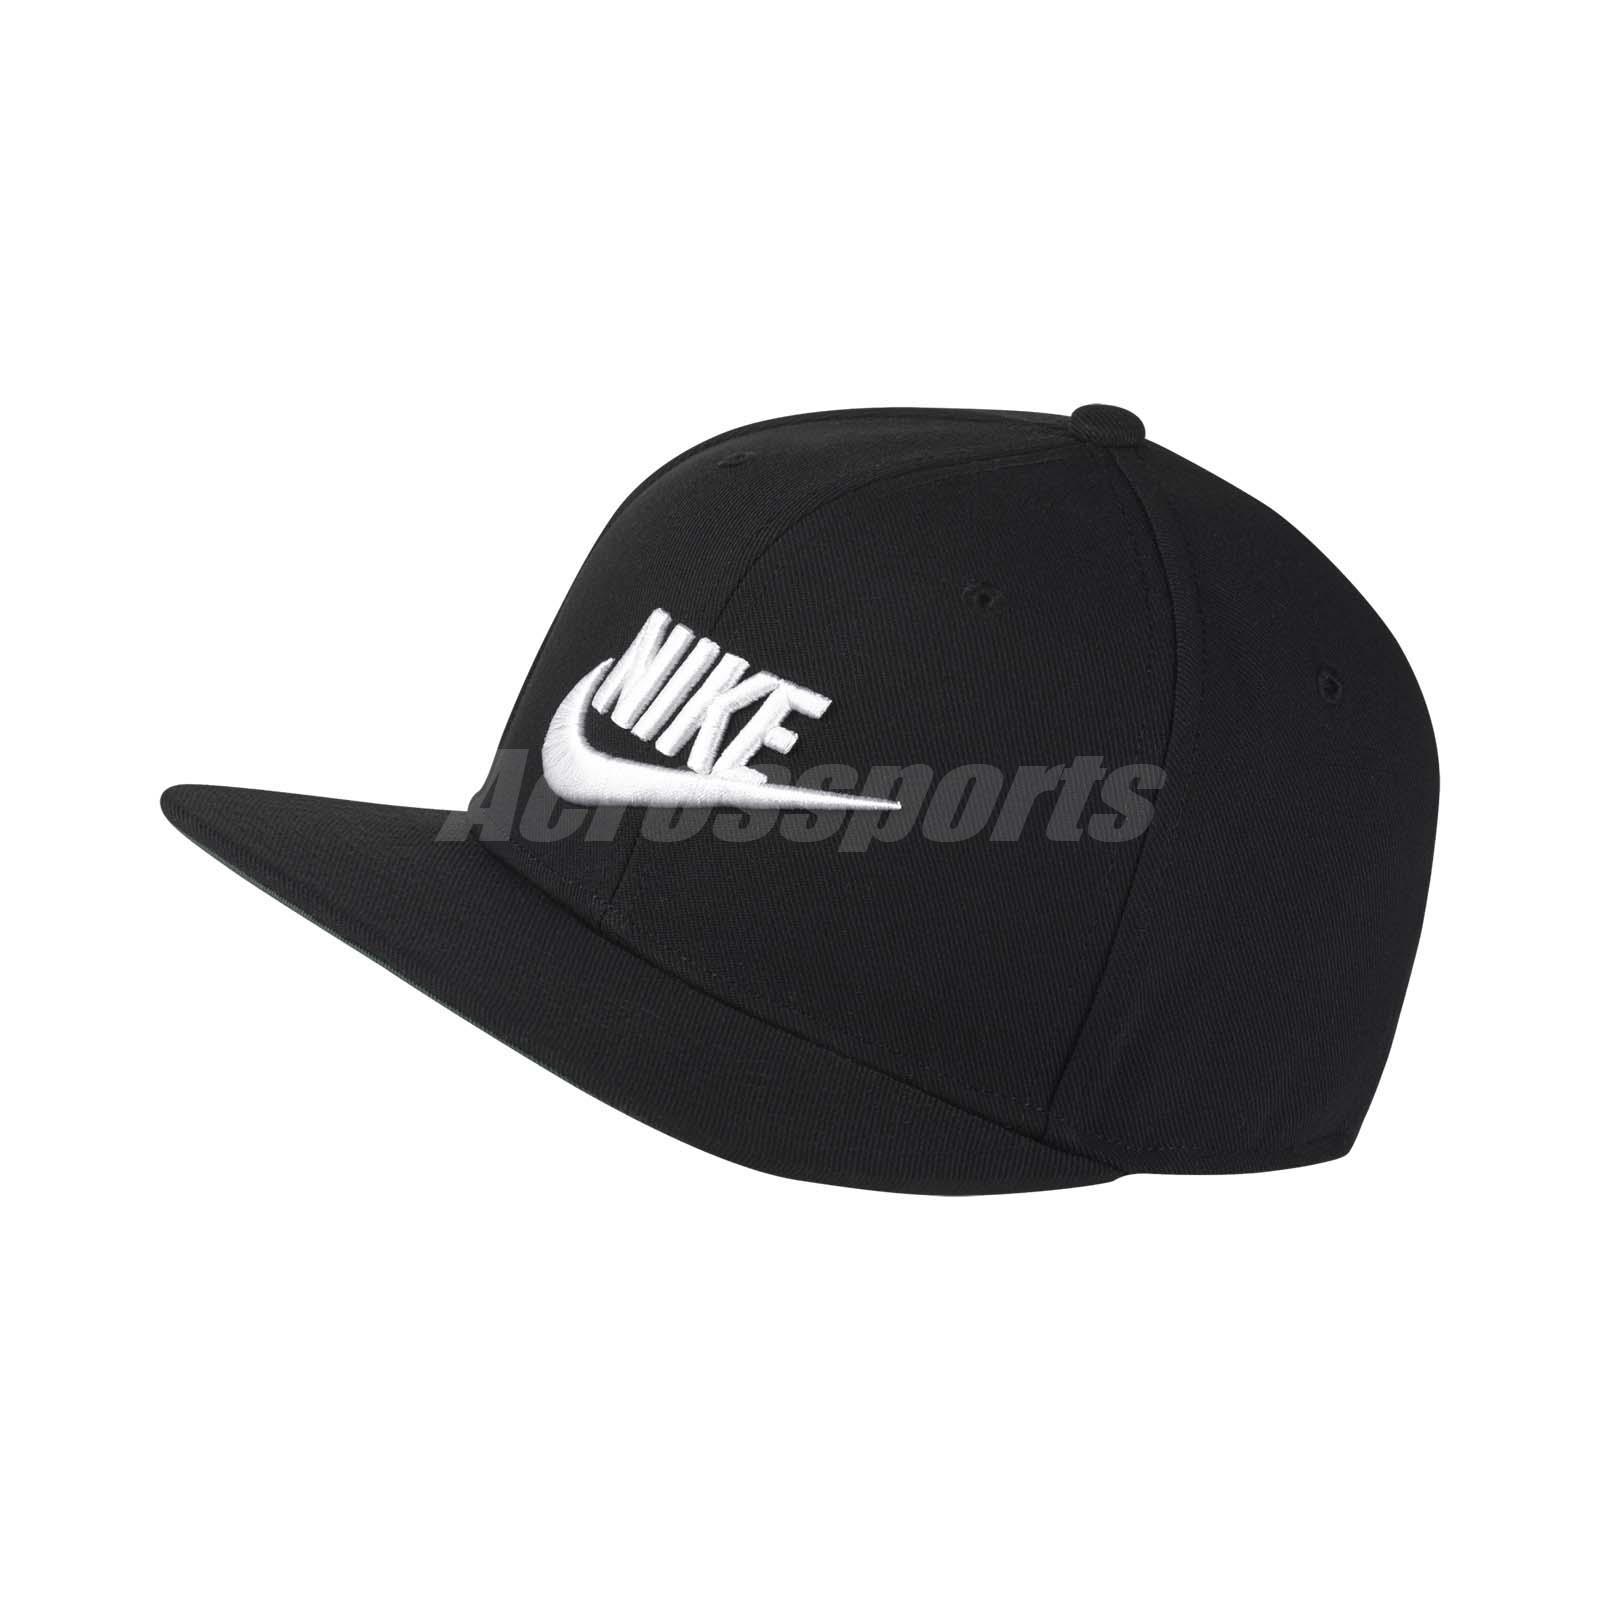 248fa33c9 Details about Nike Unisex NSW Pro Cap Futura Snapback Hat Sport Running  Black White 891284-010